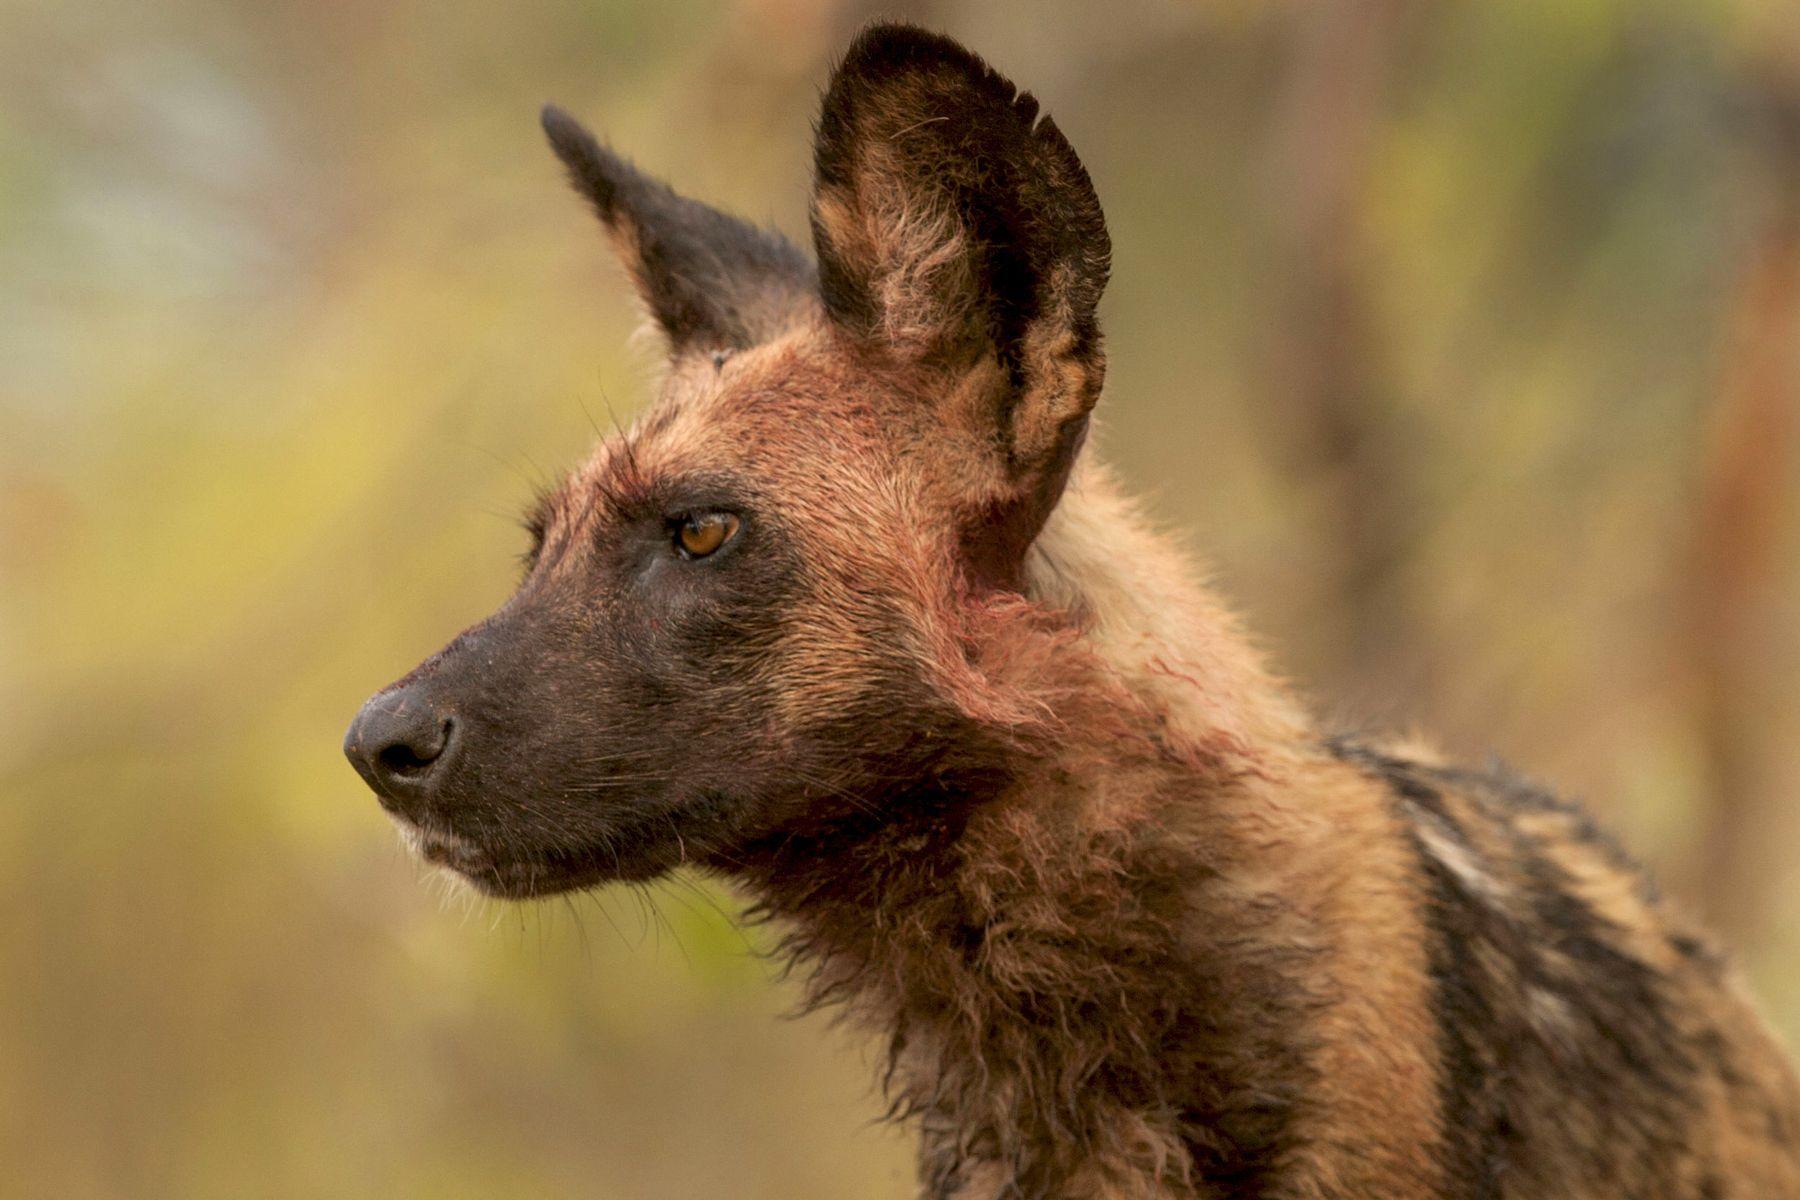 Wild Dog portrait by photographer Grant Reid